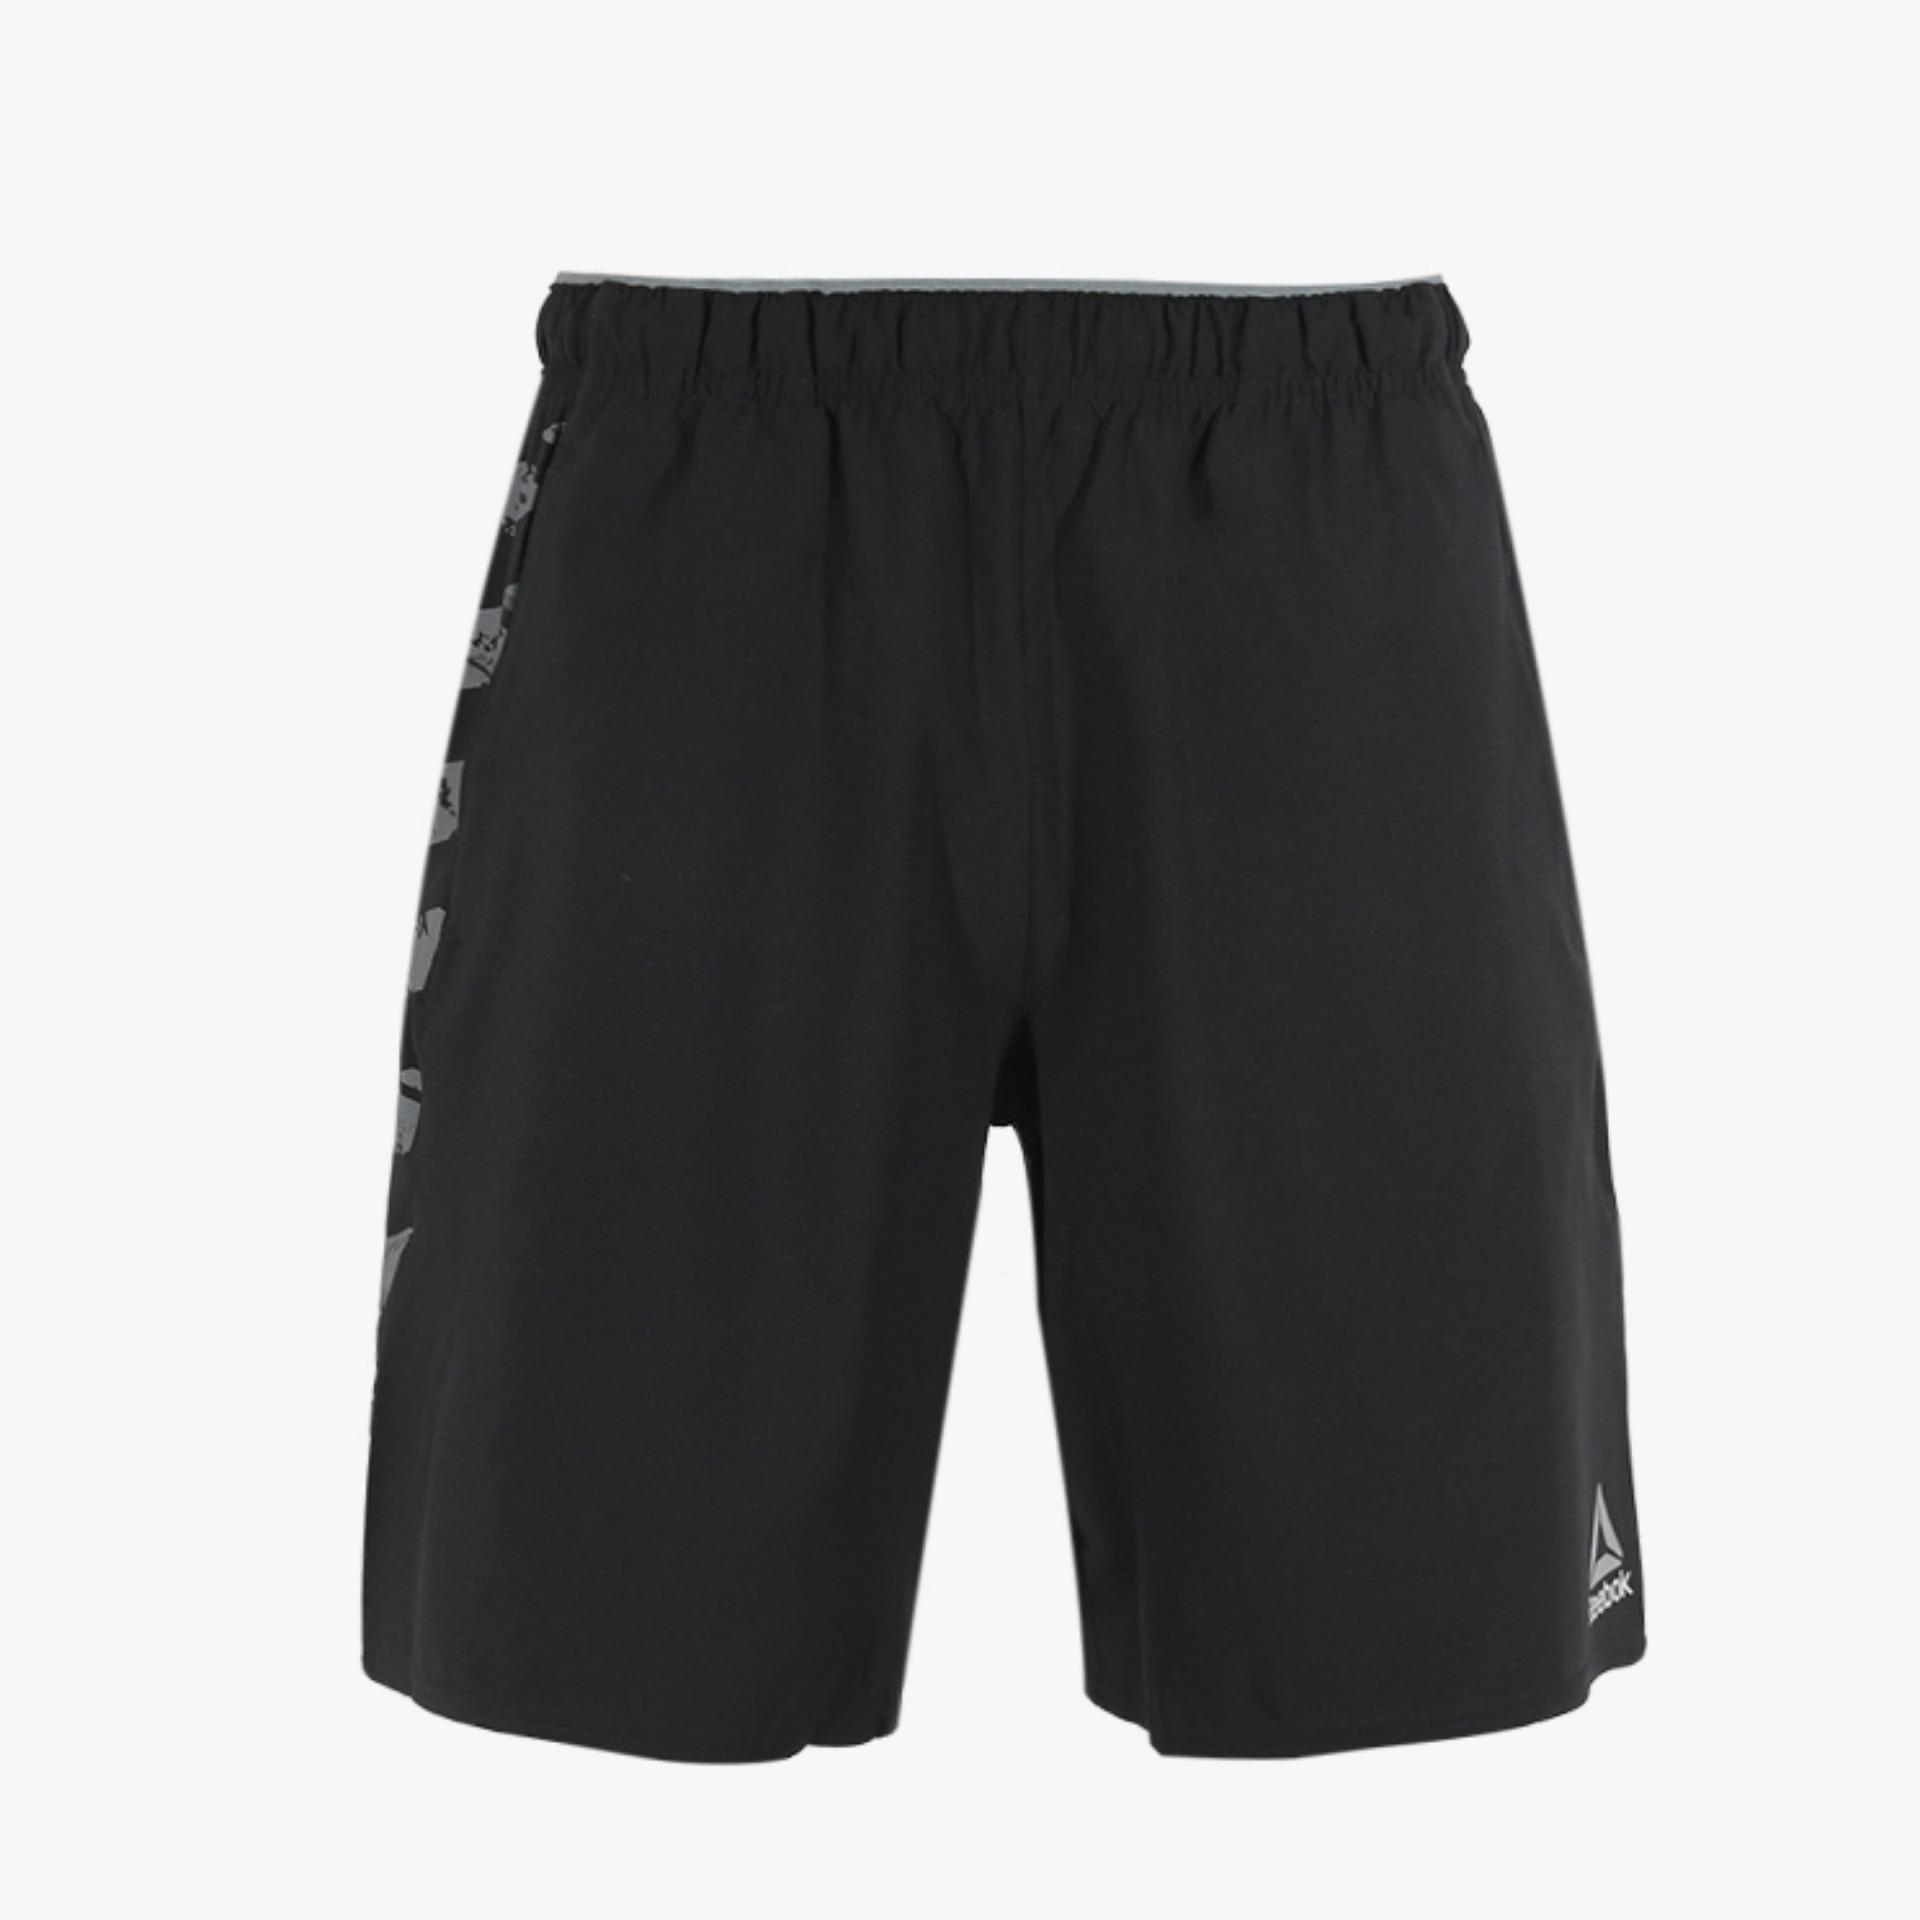 Jual Reebok Workout Ready Woven Men S Shorts Hitam Original